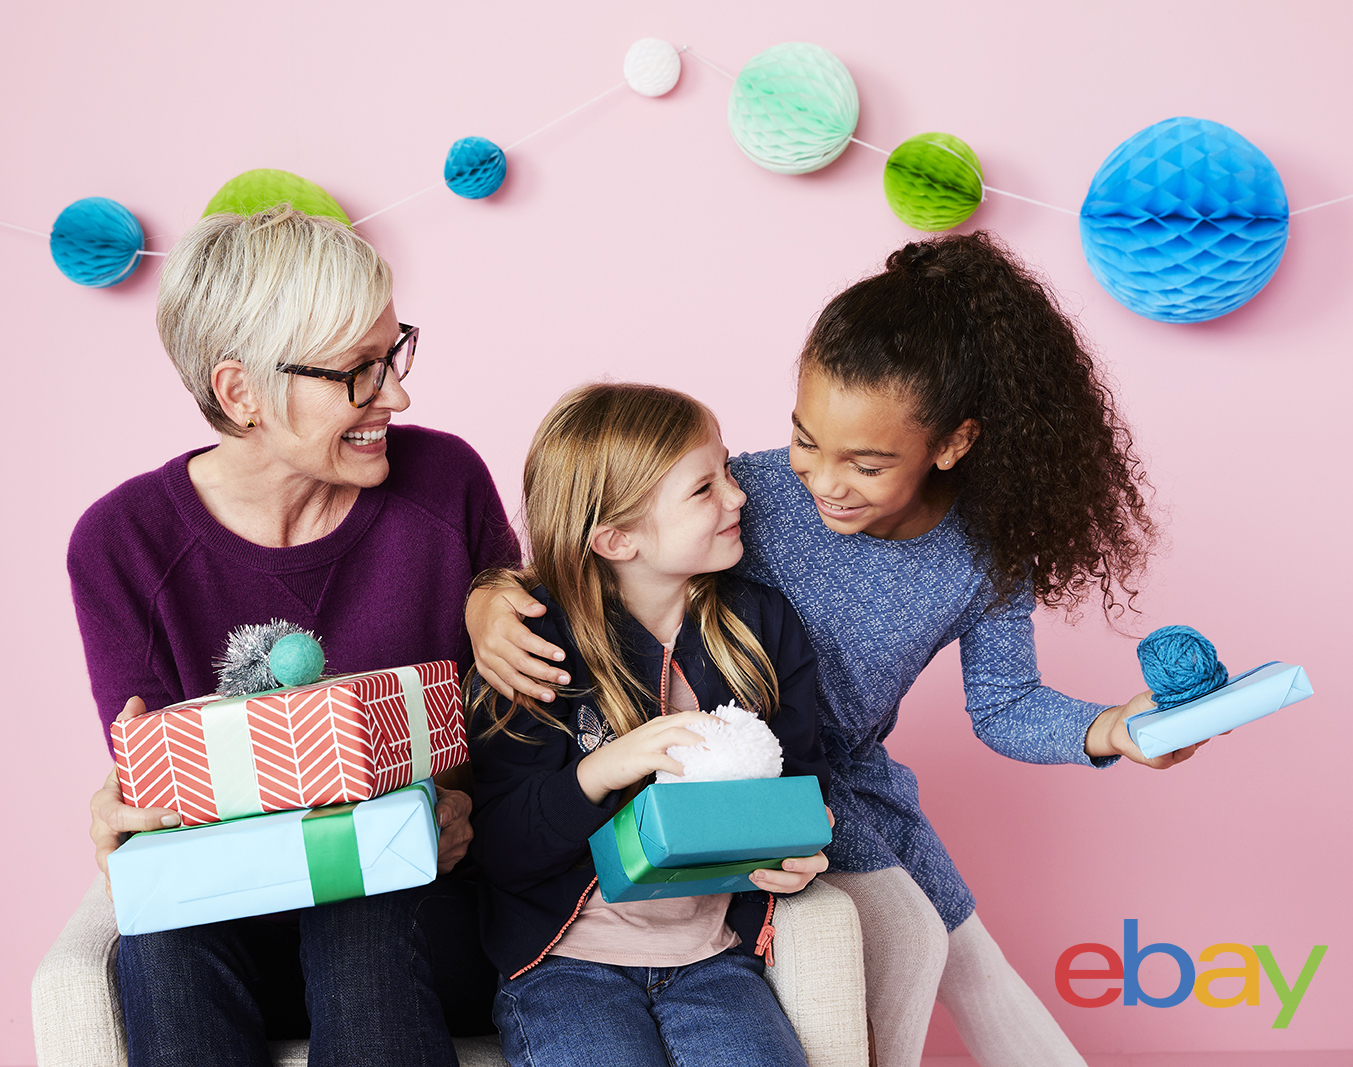 Holiday18_Campaign_Grandma_Kids_Moment_Colored_Wall_2967 copy copy.jpg